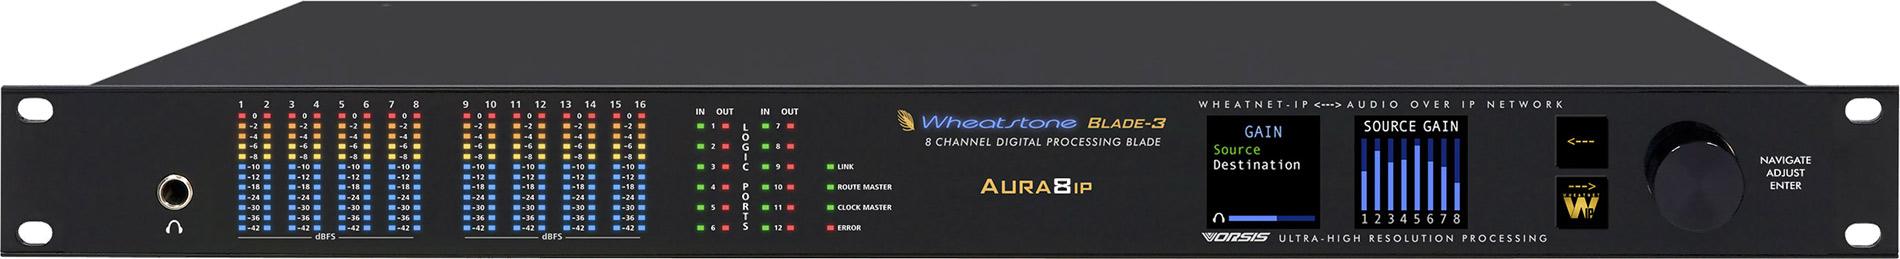 Aura8IP-3: Front